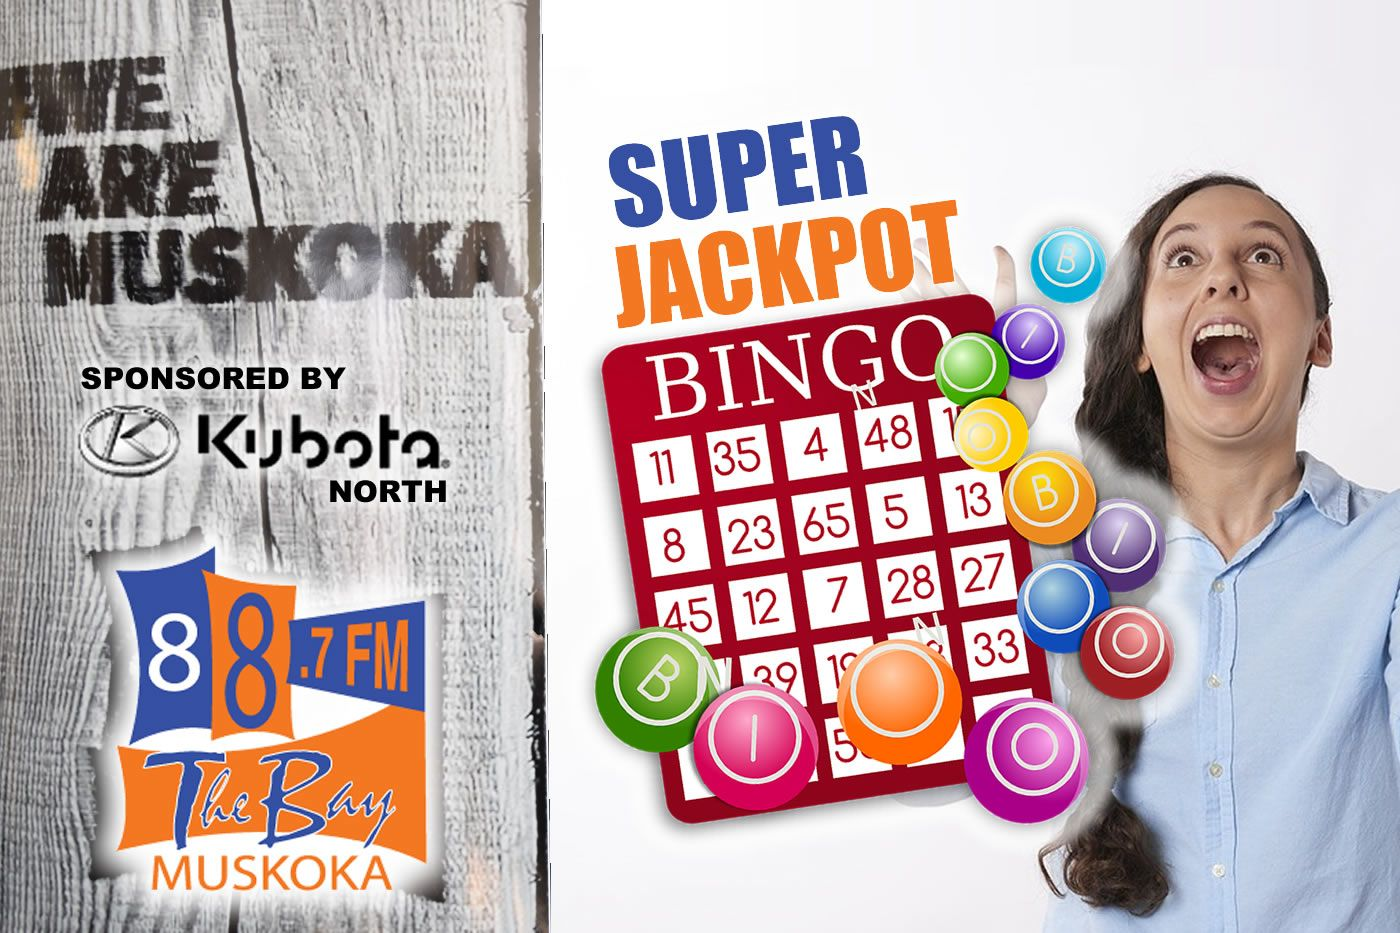 Super Jackpot Bingo